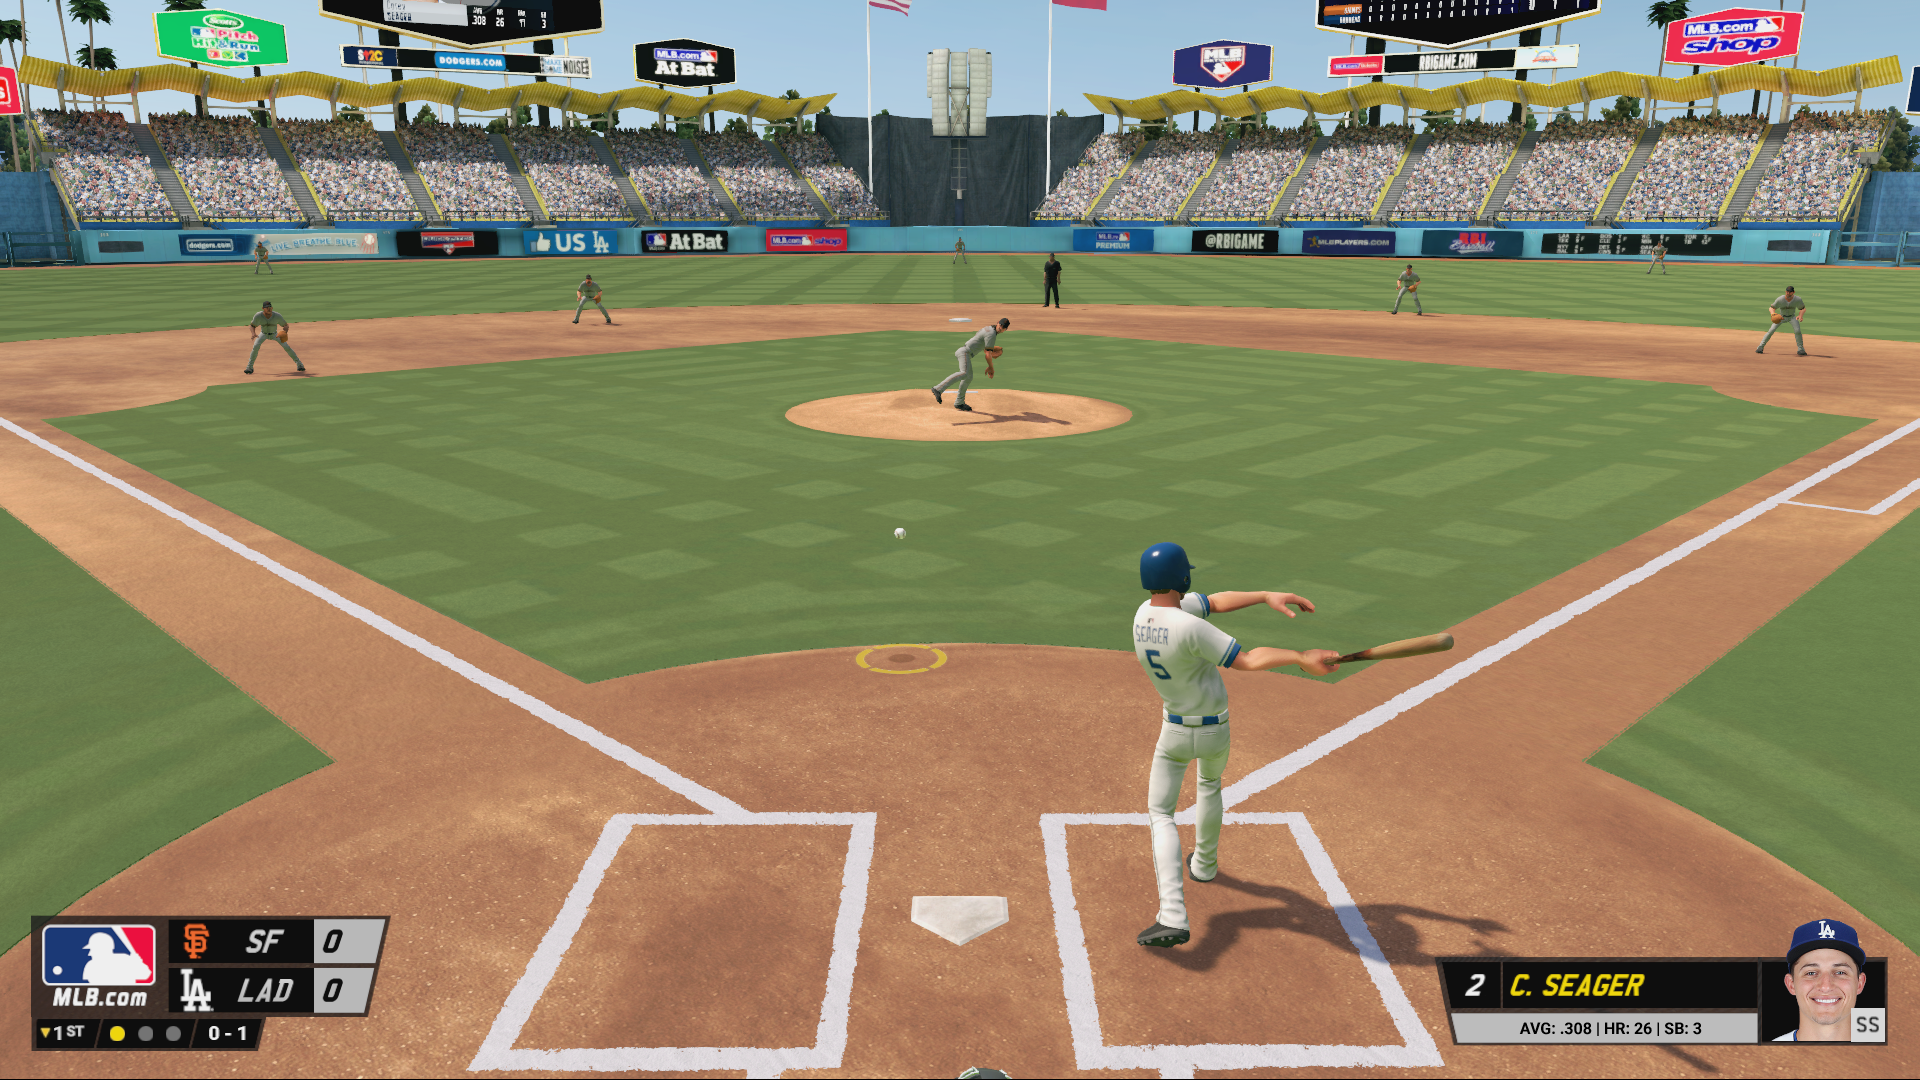 Start your own season by purchasing R.B.I. Baseball | MLB.com